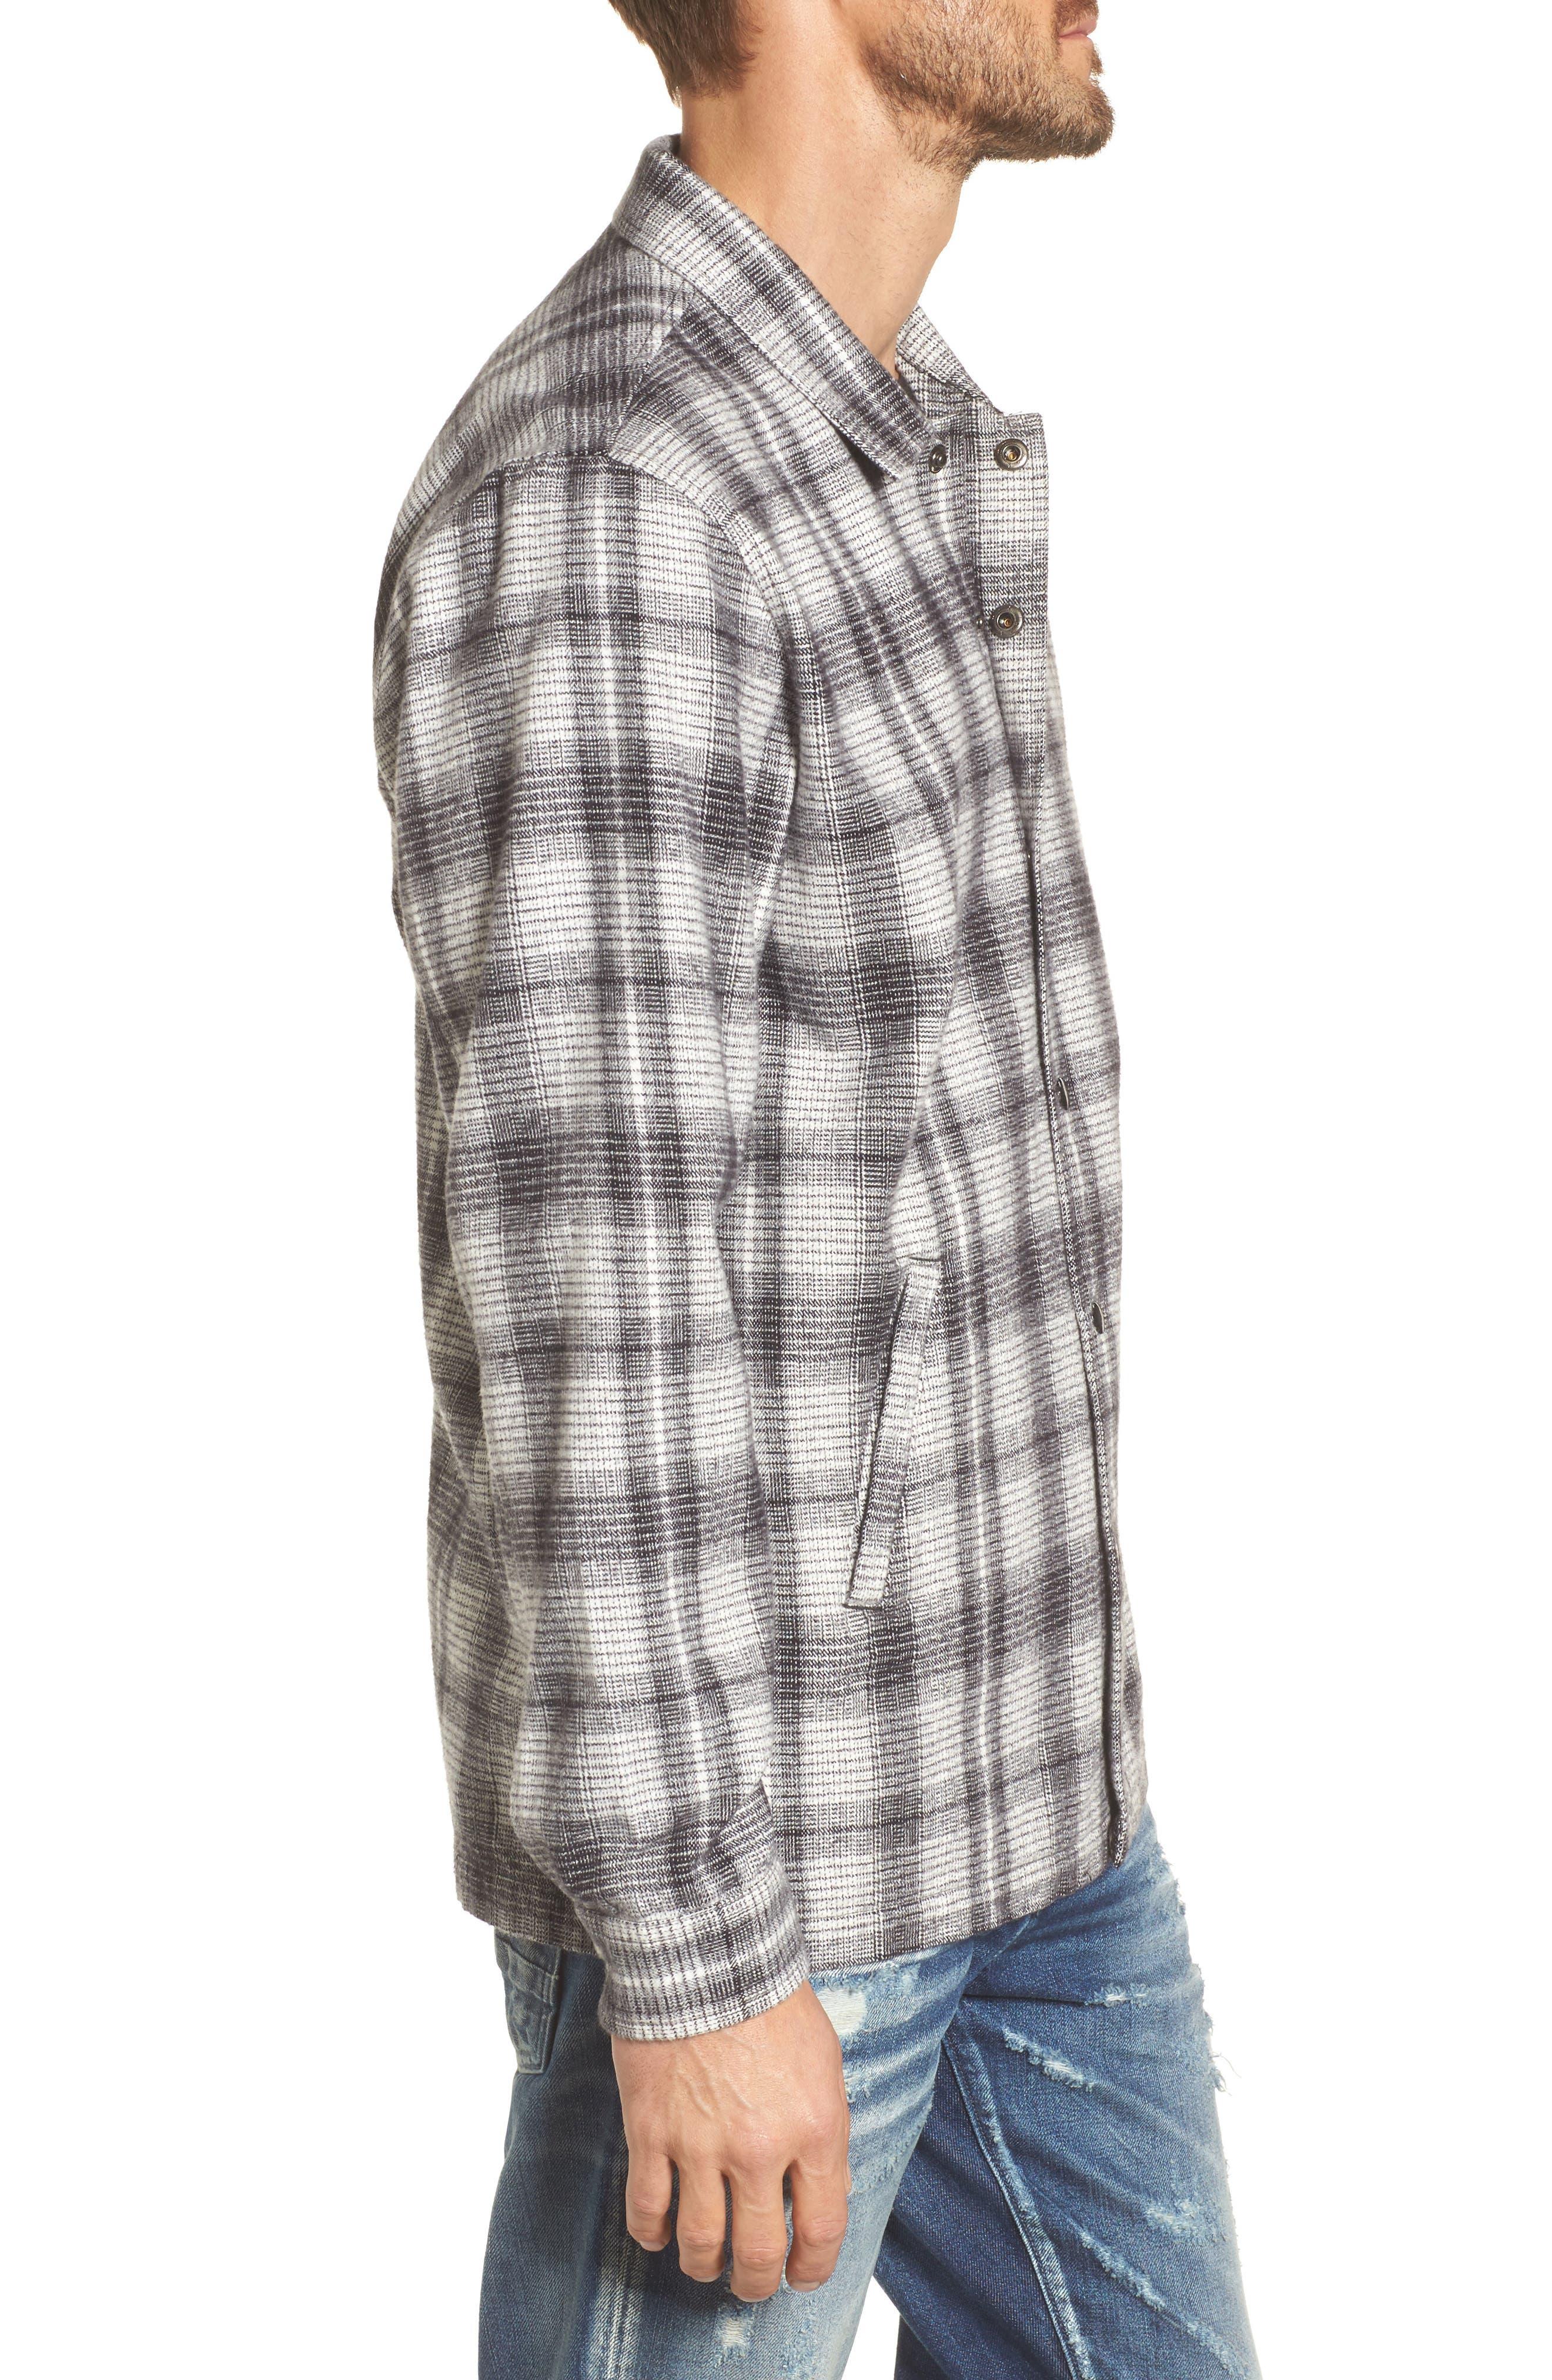 Whittier Plaid Flannel Shirt Jacket,                             Alternate thumbnail 3, color,                             Neutral Grey Multi